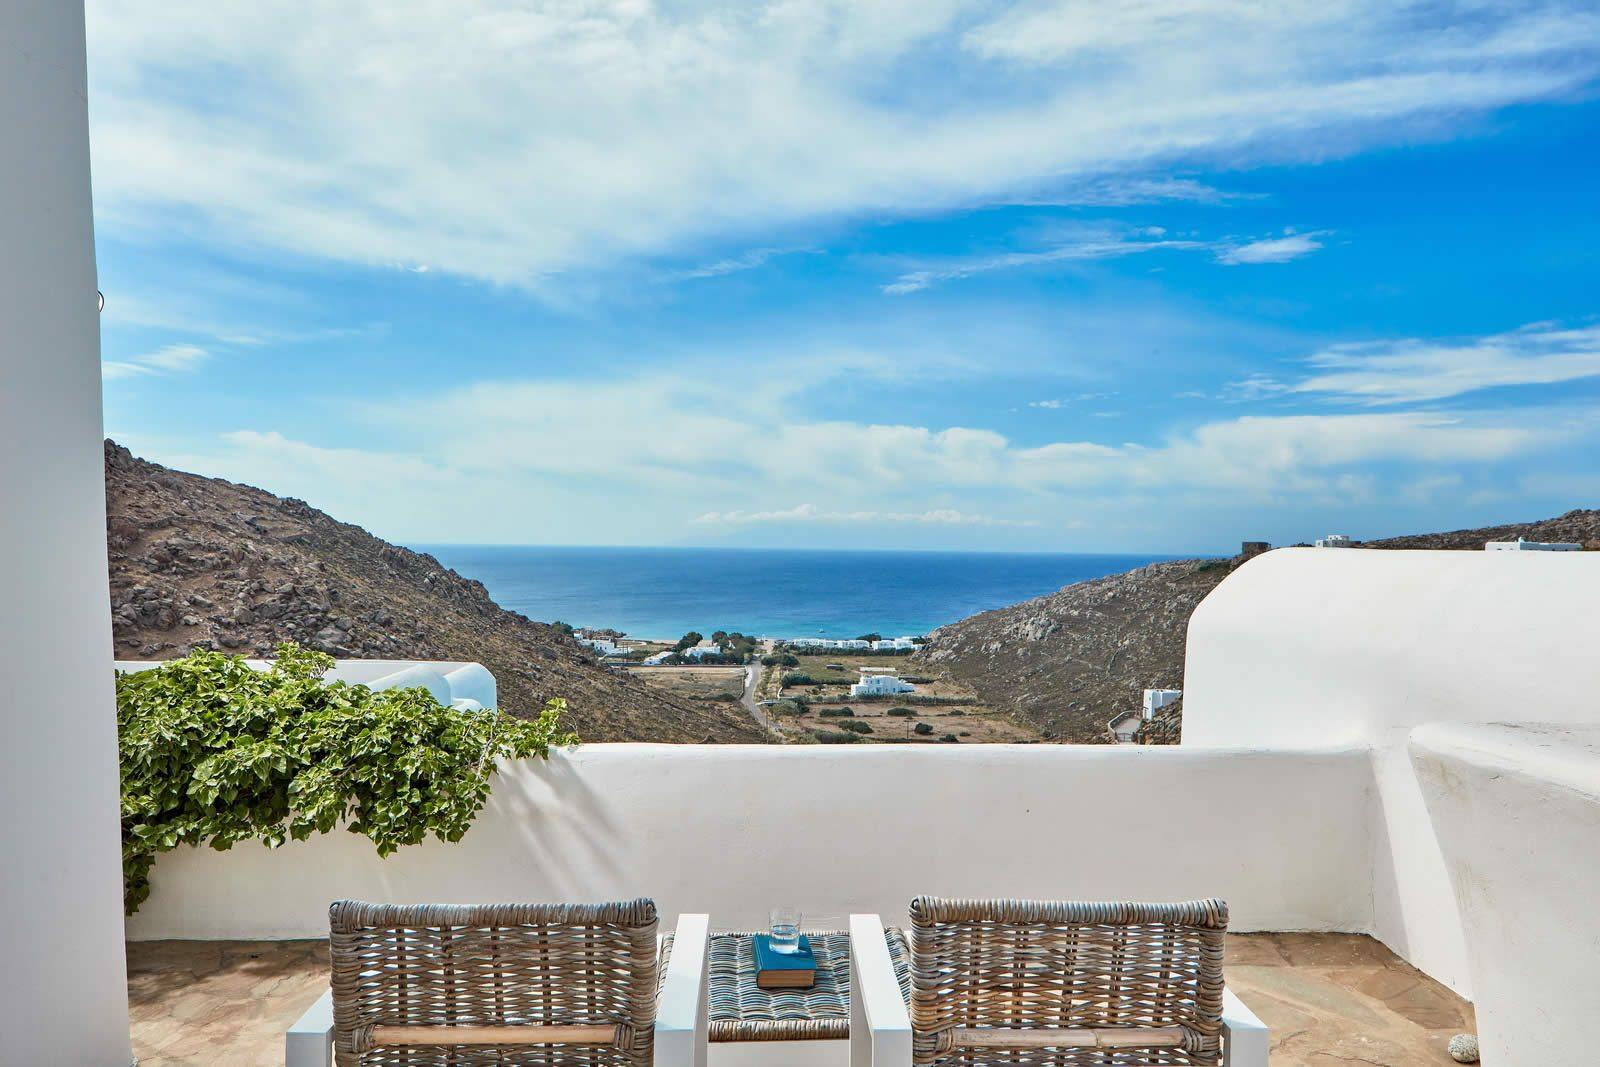 villa-luxe-vue-imprenable-mer-a-vendre-plage-agrari-mykonos-piscine-jacuzzi-cheminee